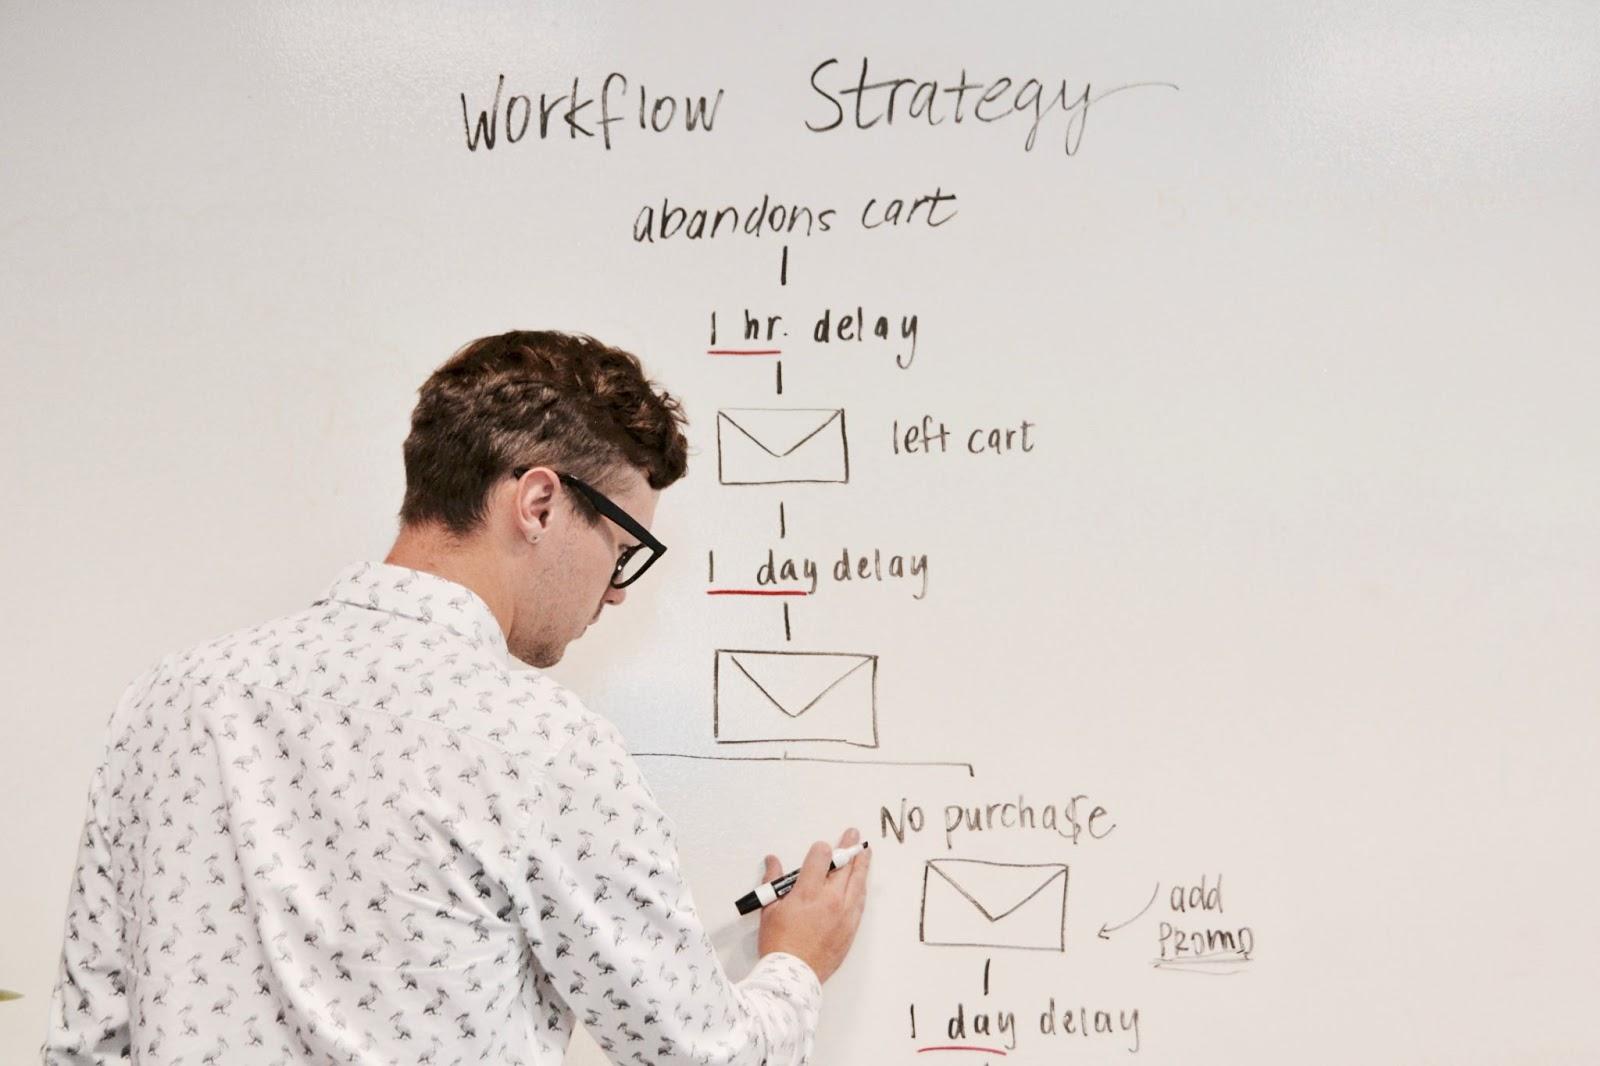 Email marketing agency, email marketing metrics, b2b email marketing, email marketing consultant, crm email marketing